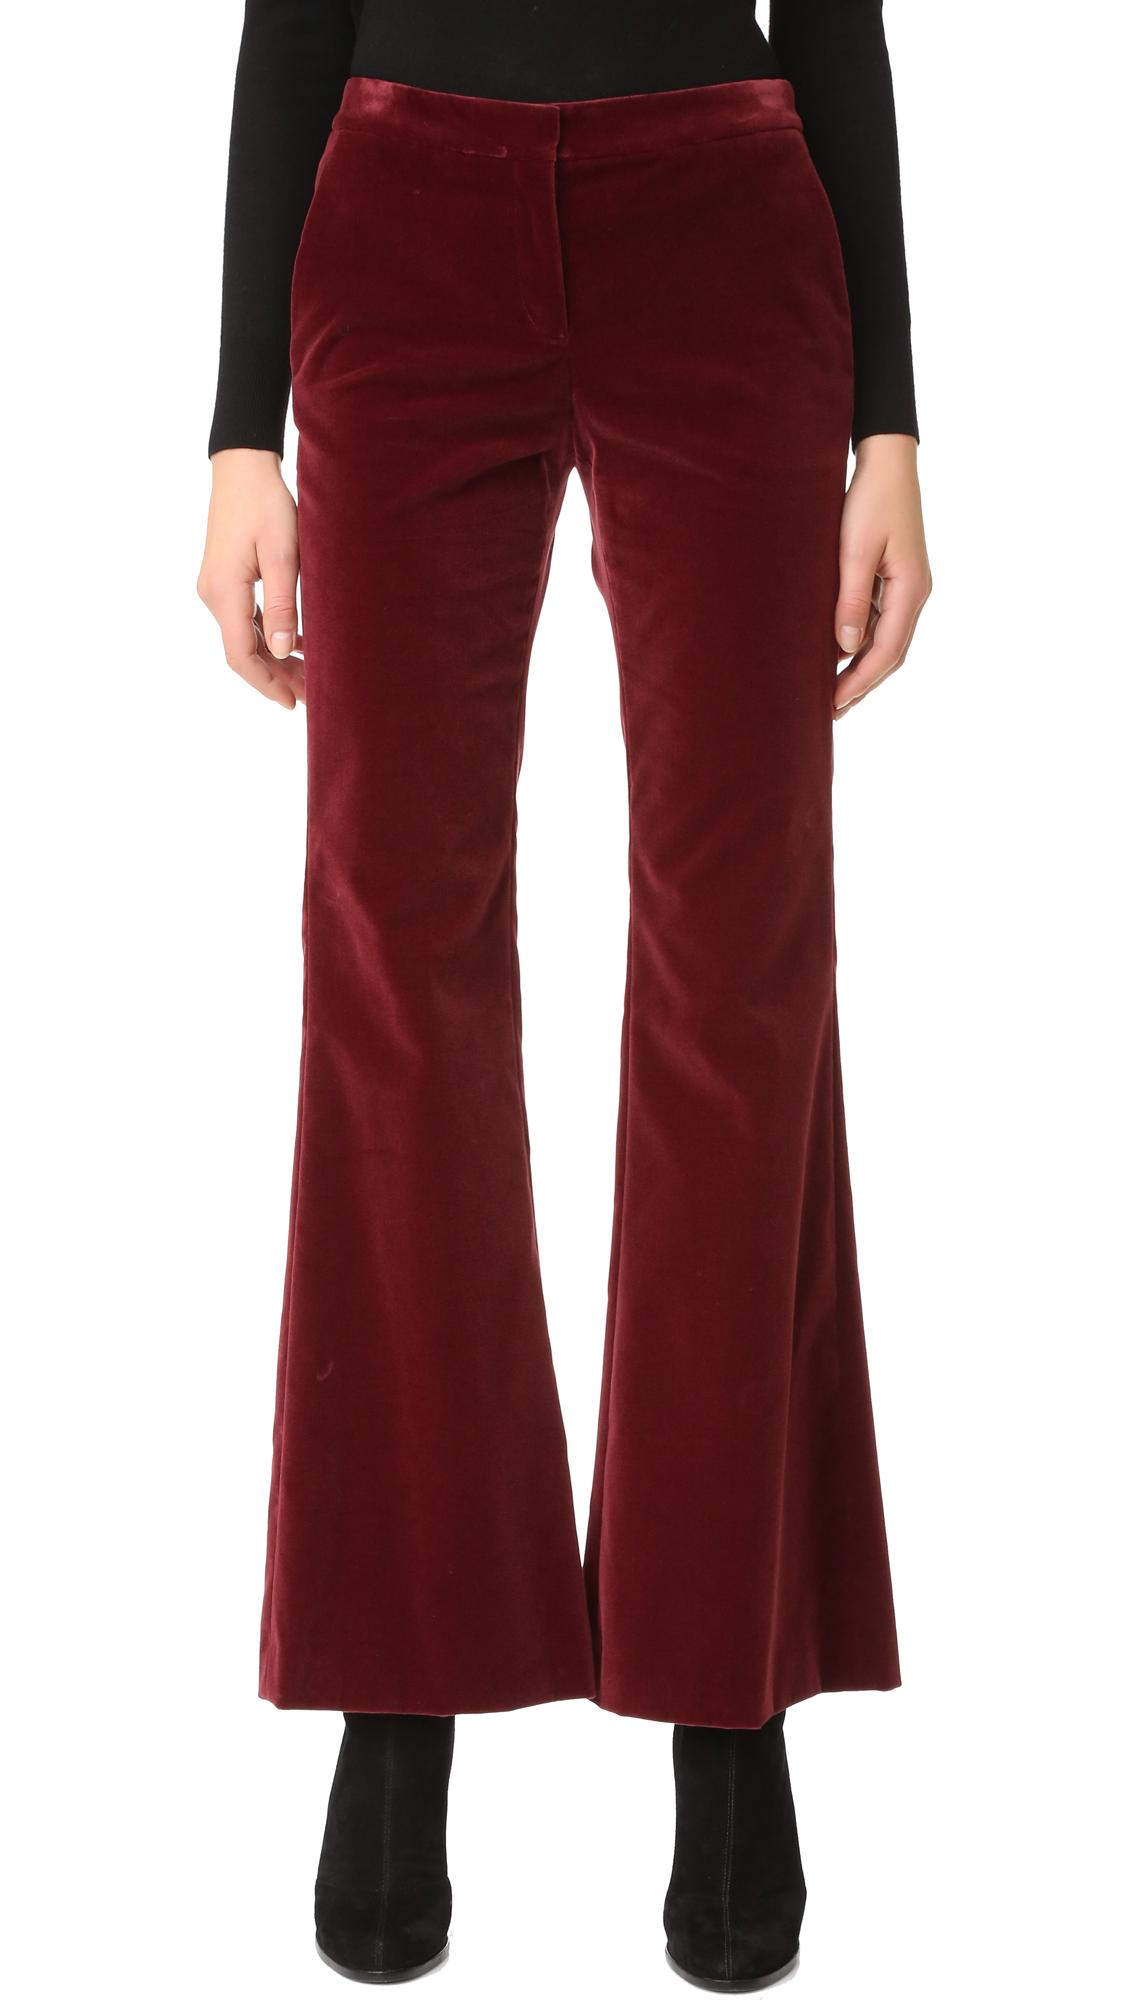 Theory Caroleena Velvet Pants - Black Cherry at Shopbop